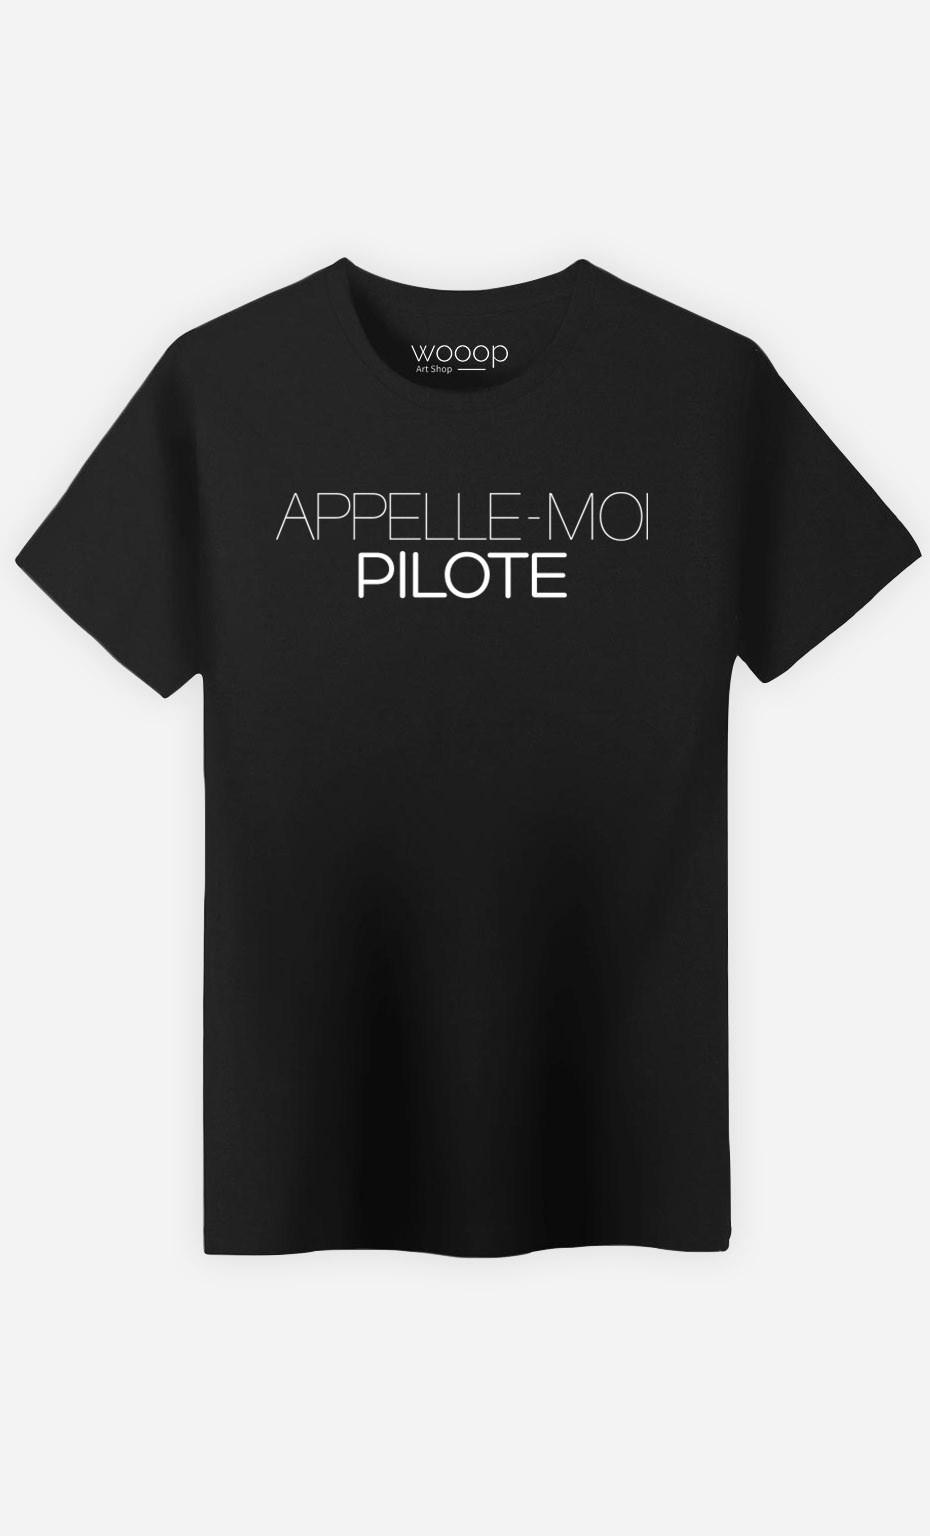 T-Shirt Appelle-Moi Pilote